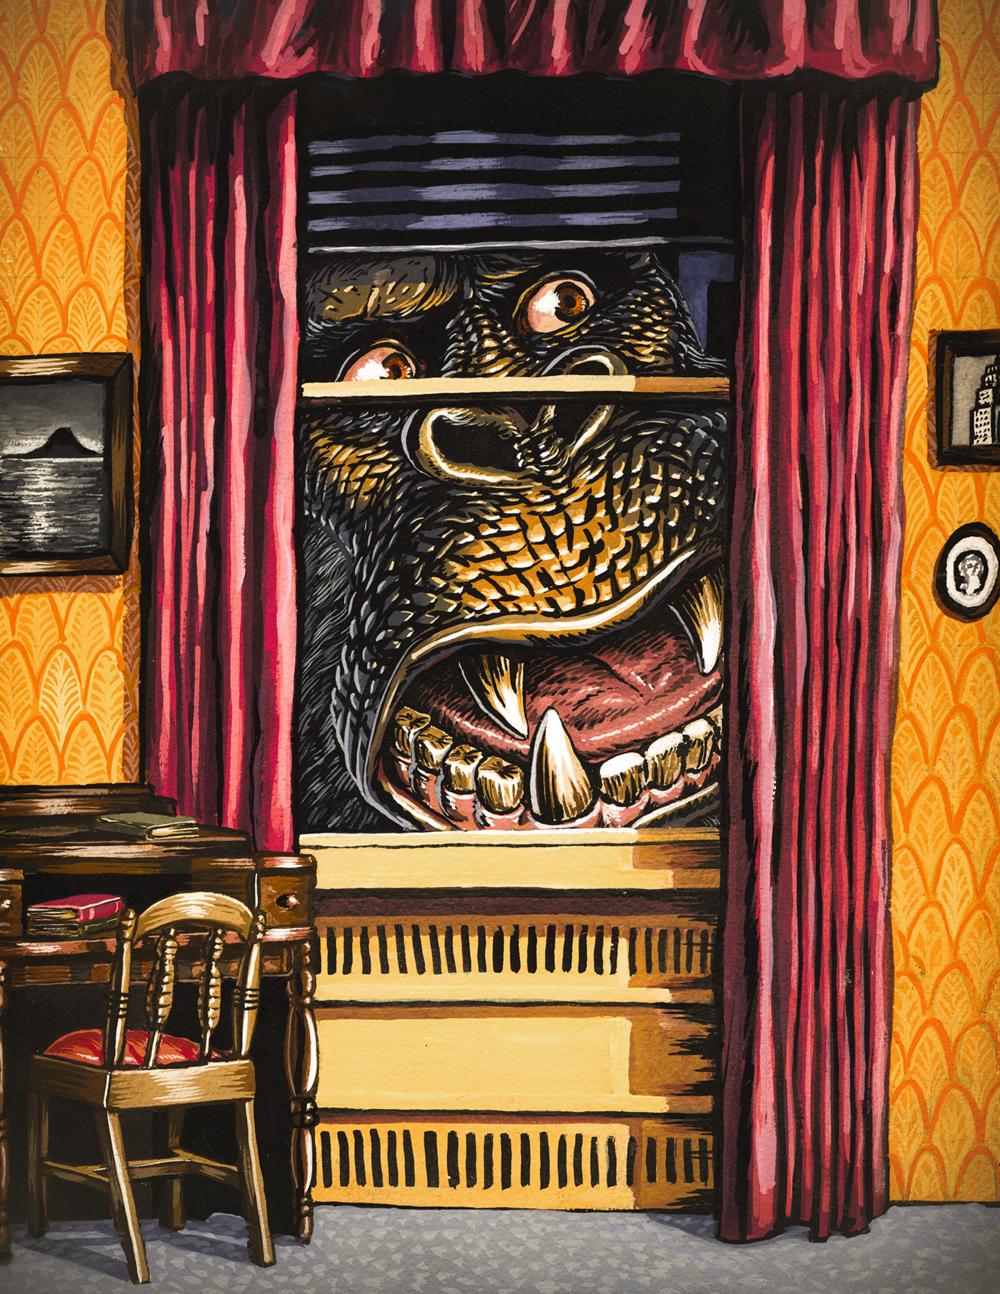 Peeping Kong , gouache on paper, 2015